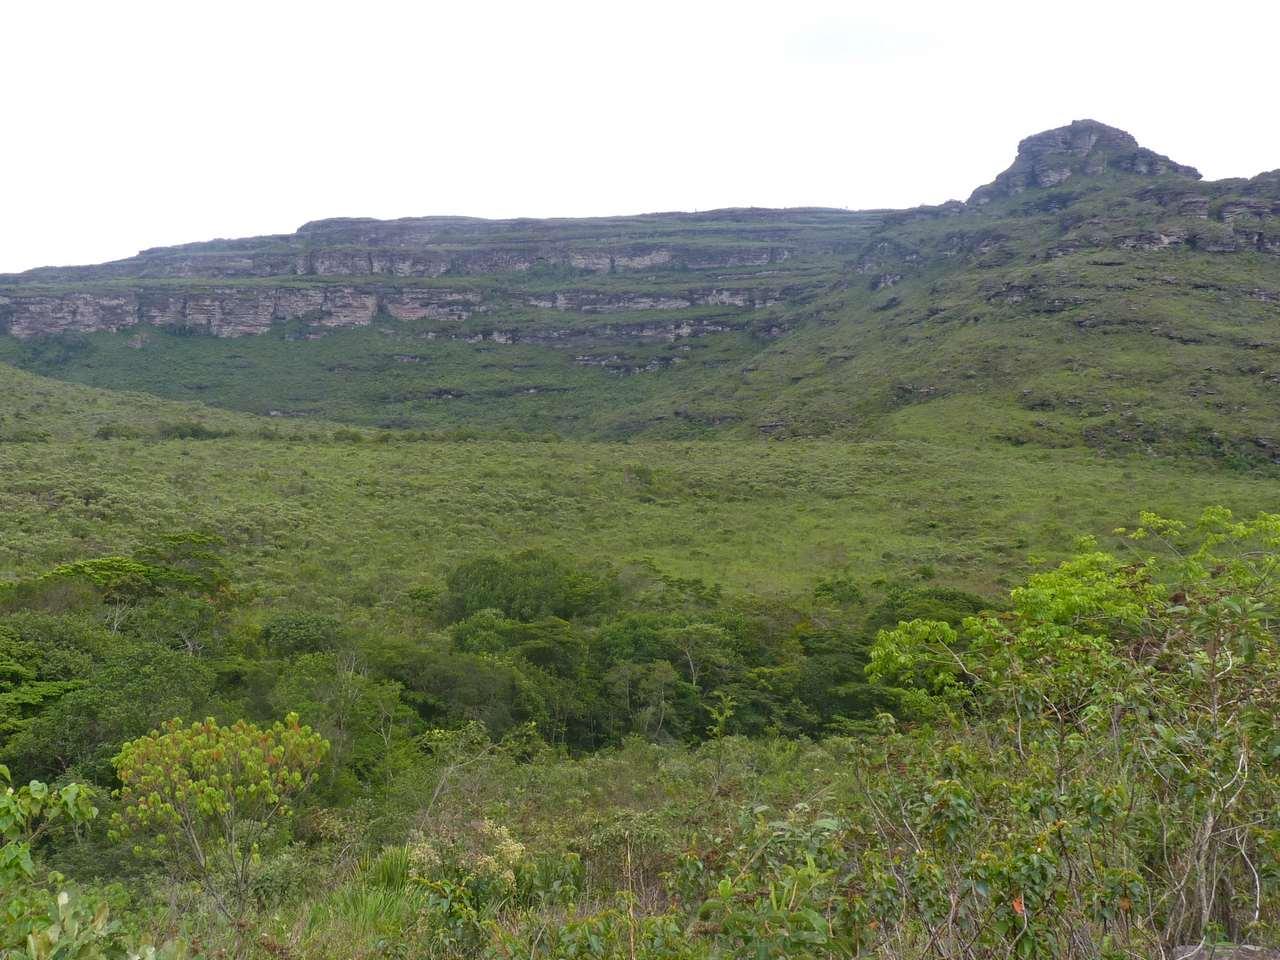 Trilha Pai Inacio Barro Branco Lencois, Chapada Diamantina, Bahia, Brazil (7)